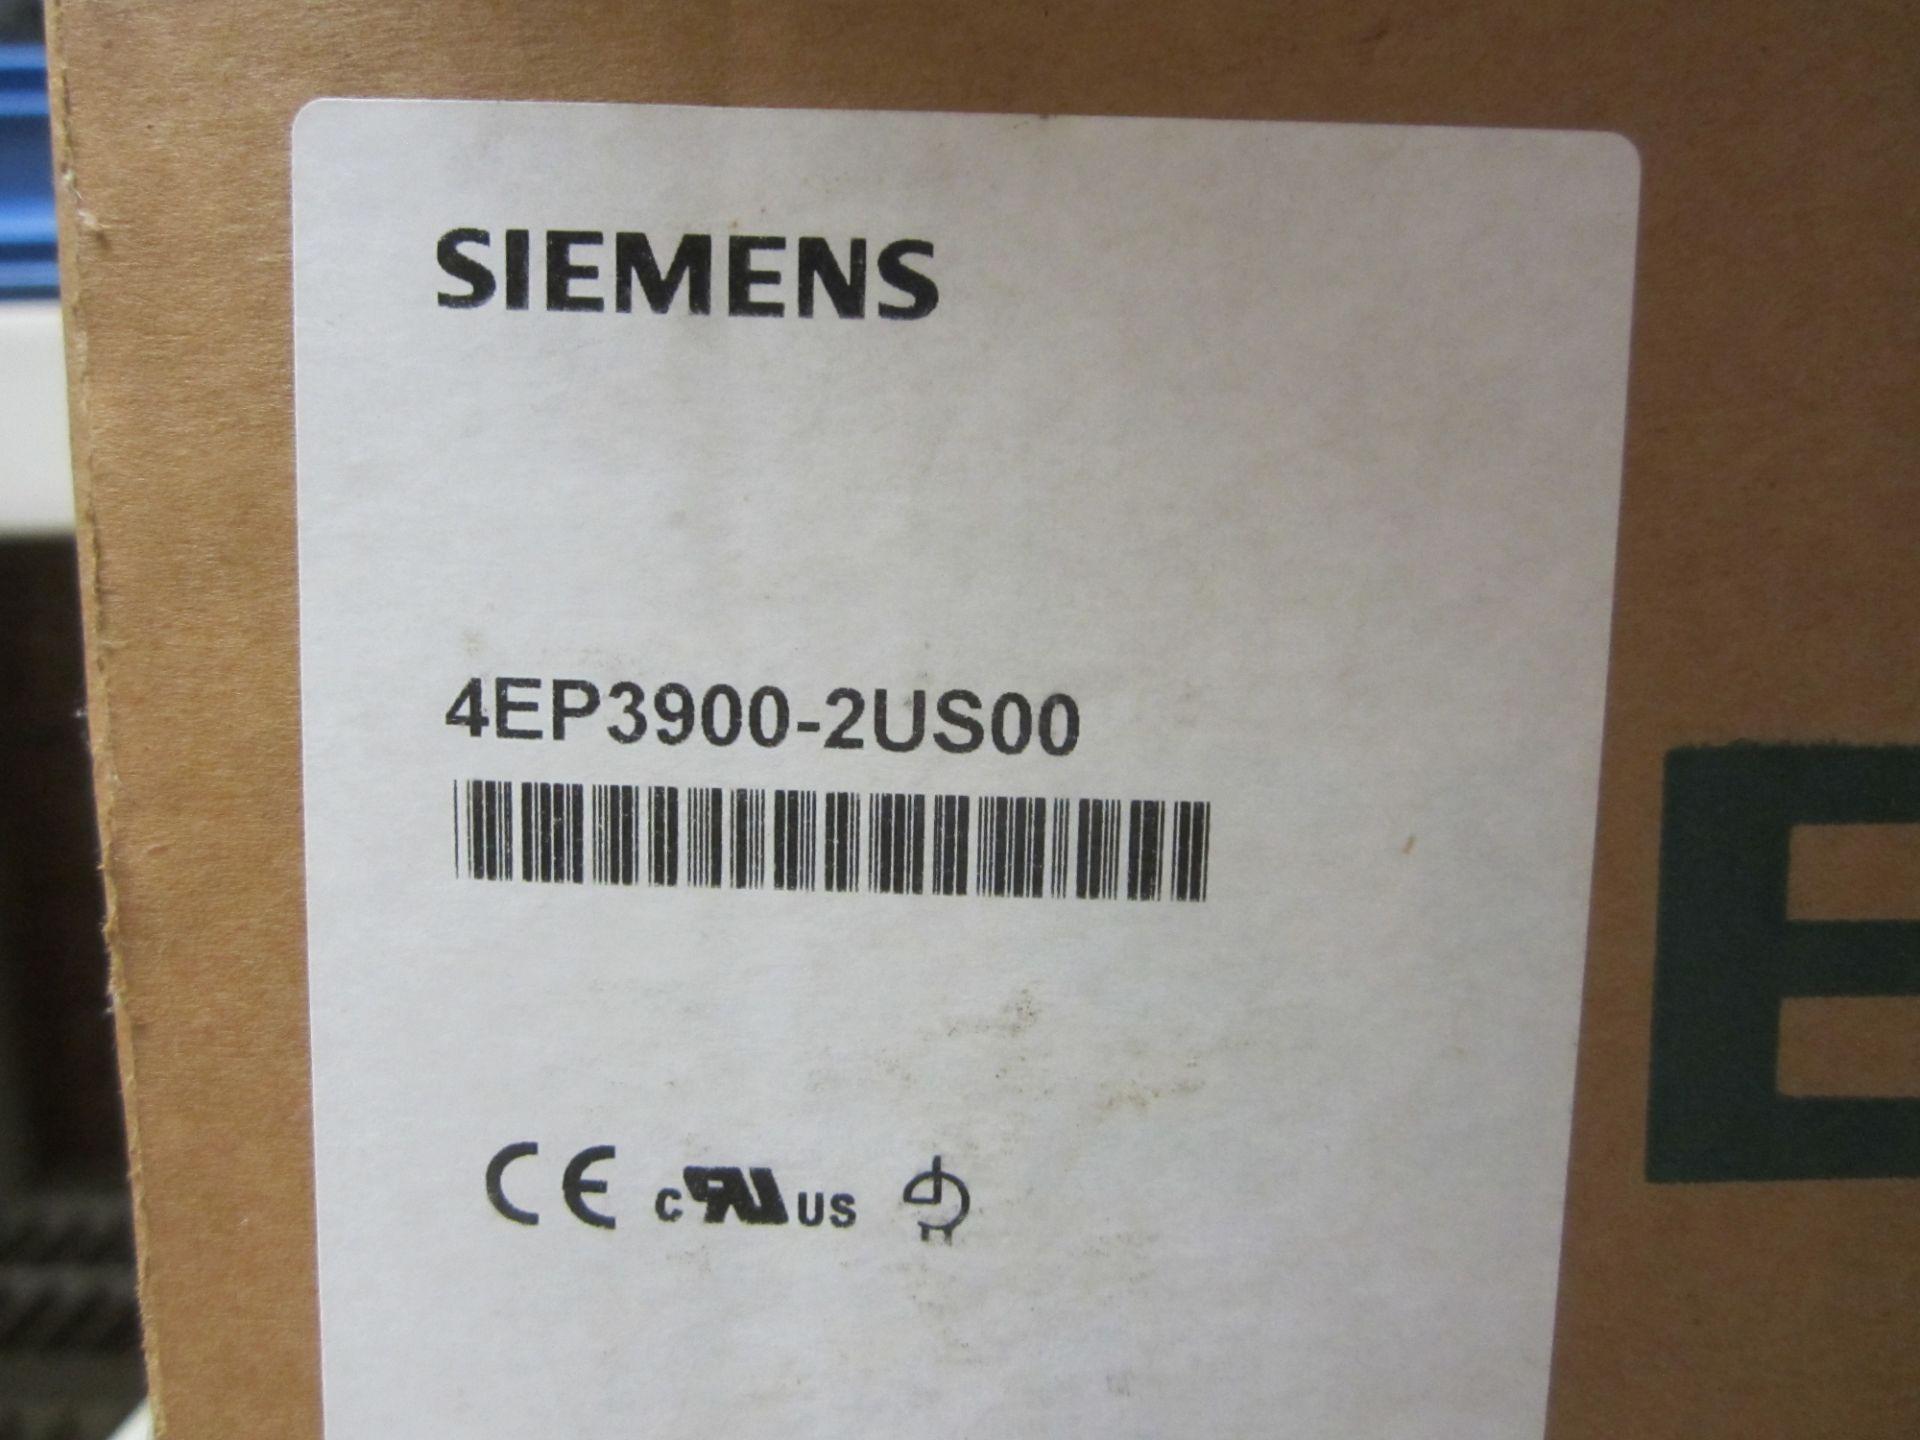 Siemens 4EP3900-2US00 Mains Choker, New in Box - Image 2 of 2